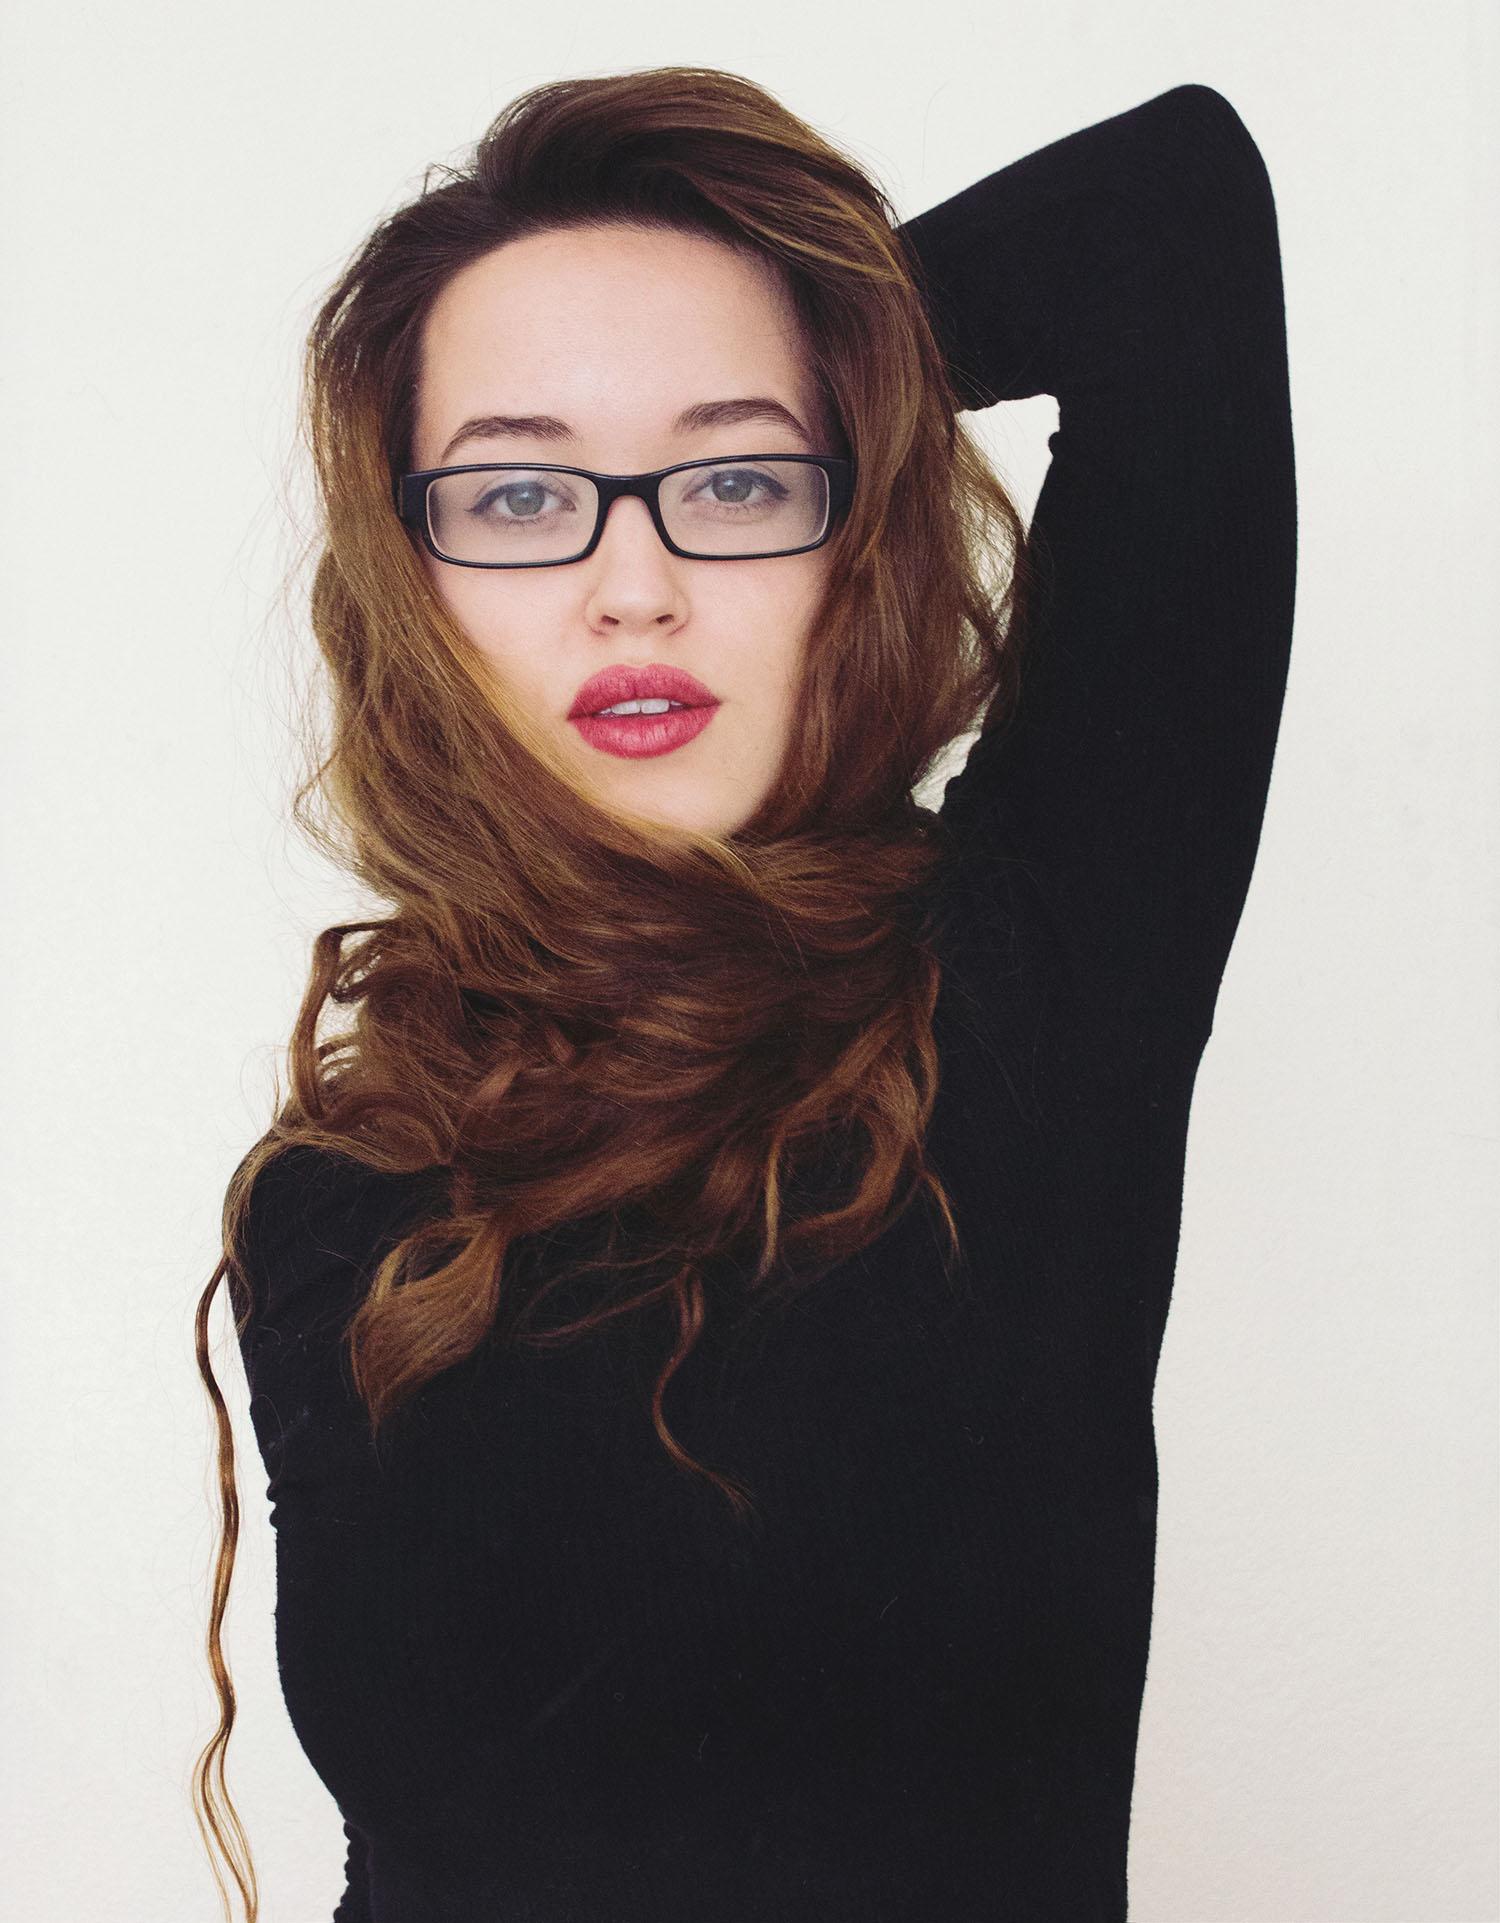 self portrait, emily joy wilson, glasses, hair, style, fashion, red lipstick